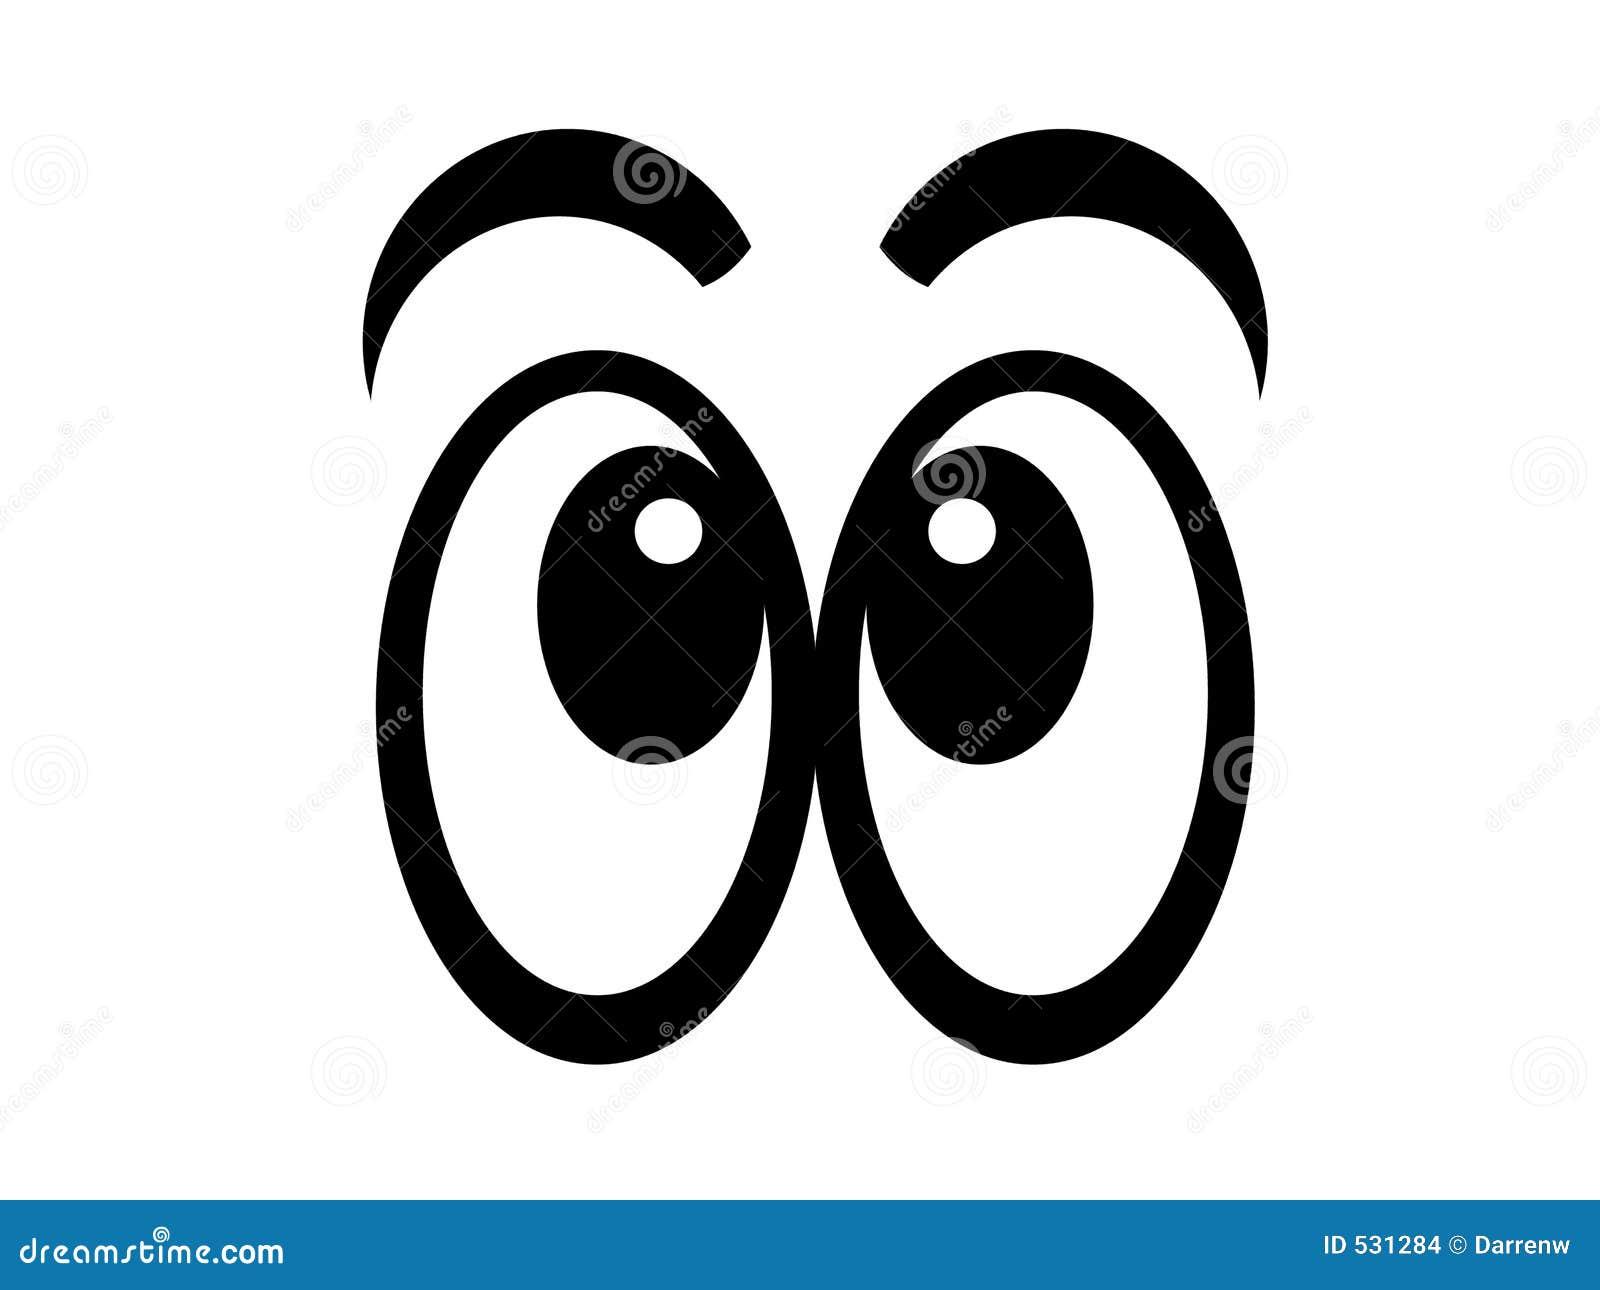 Bw cómico dos olhos